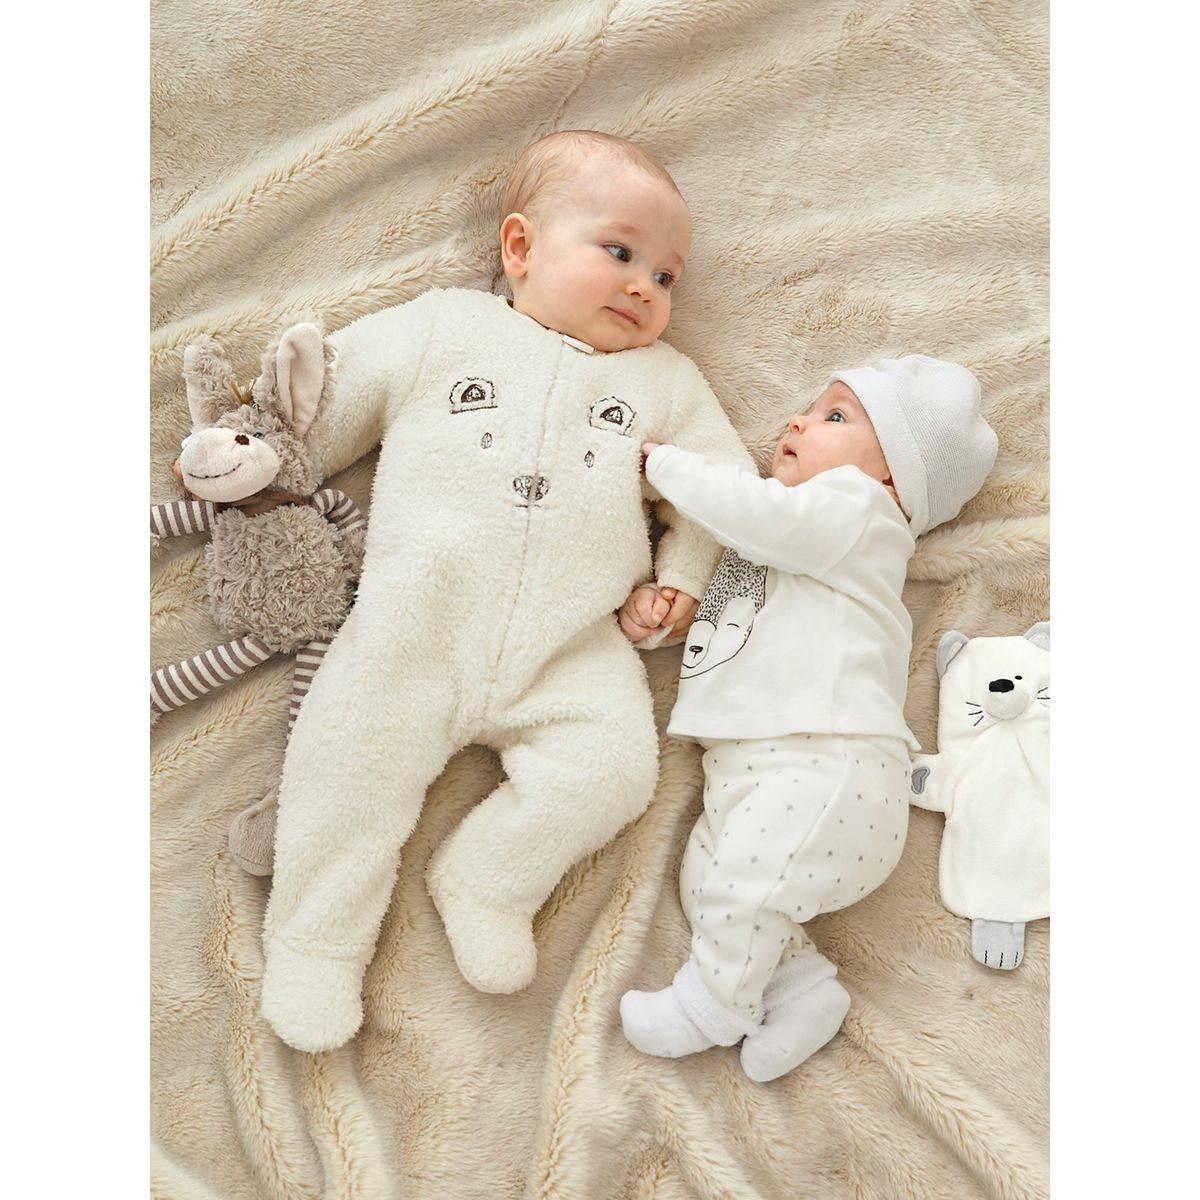 Bebe en pyjama jusqu'à quel age